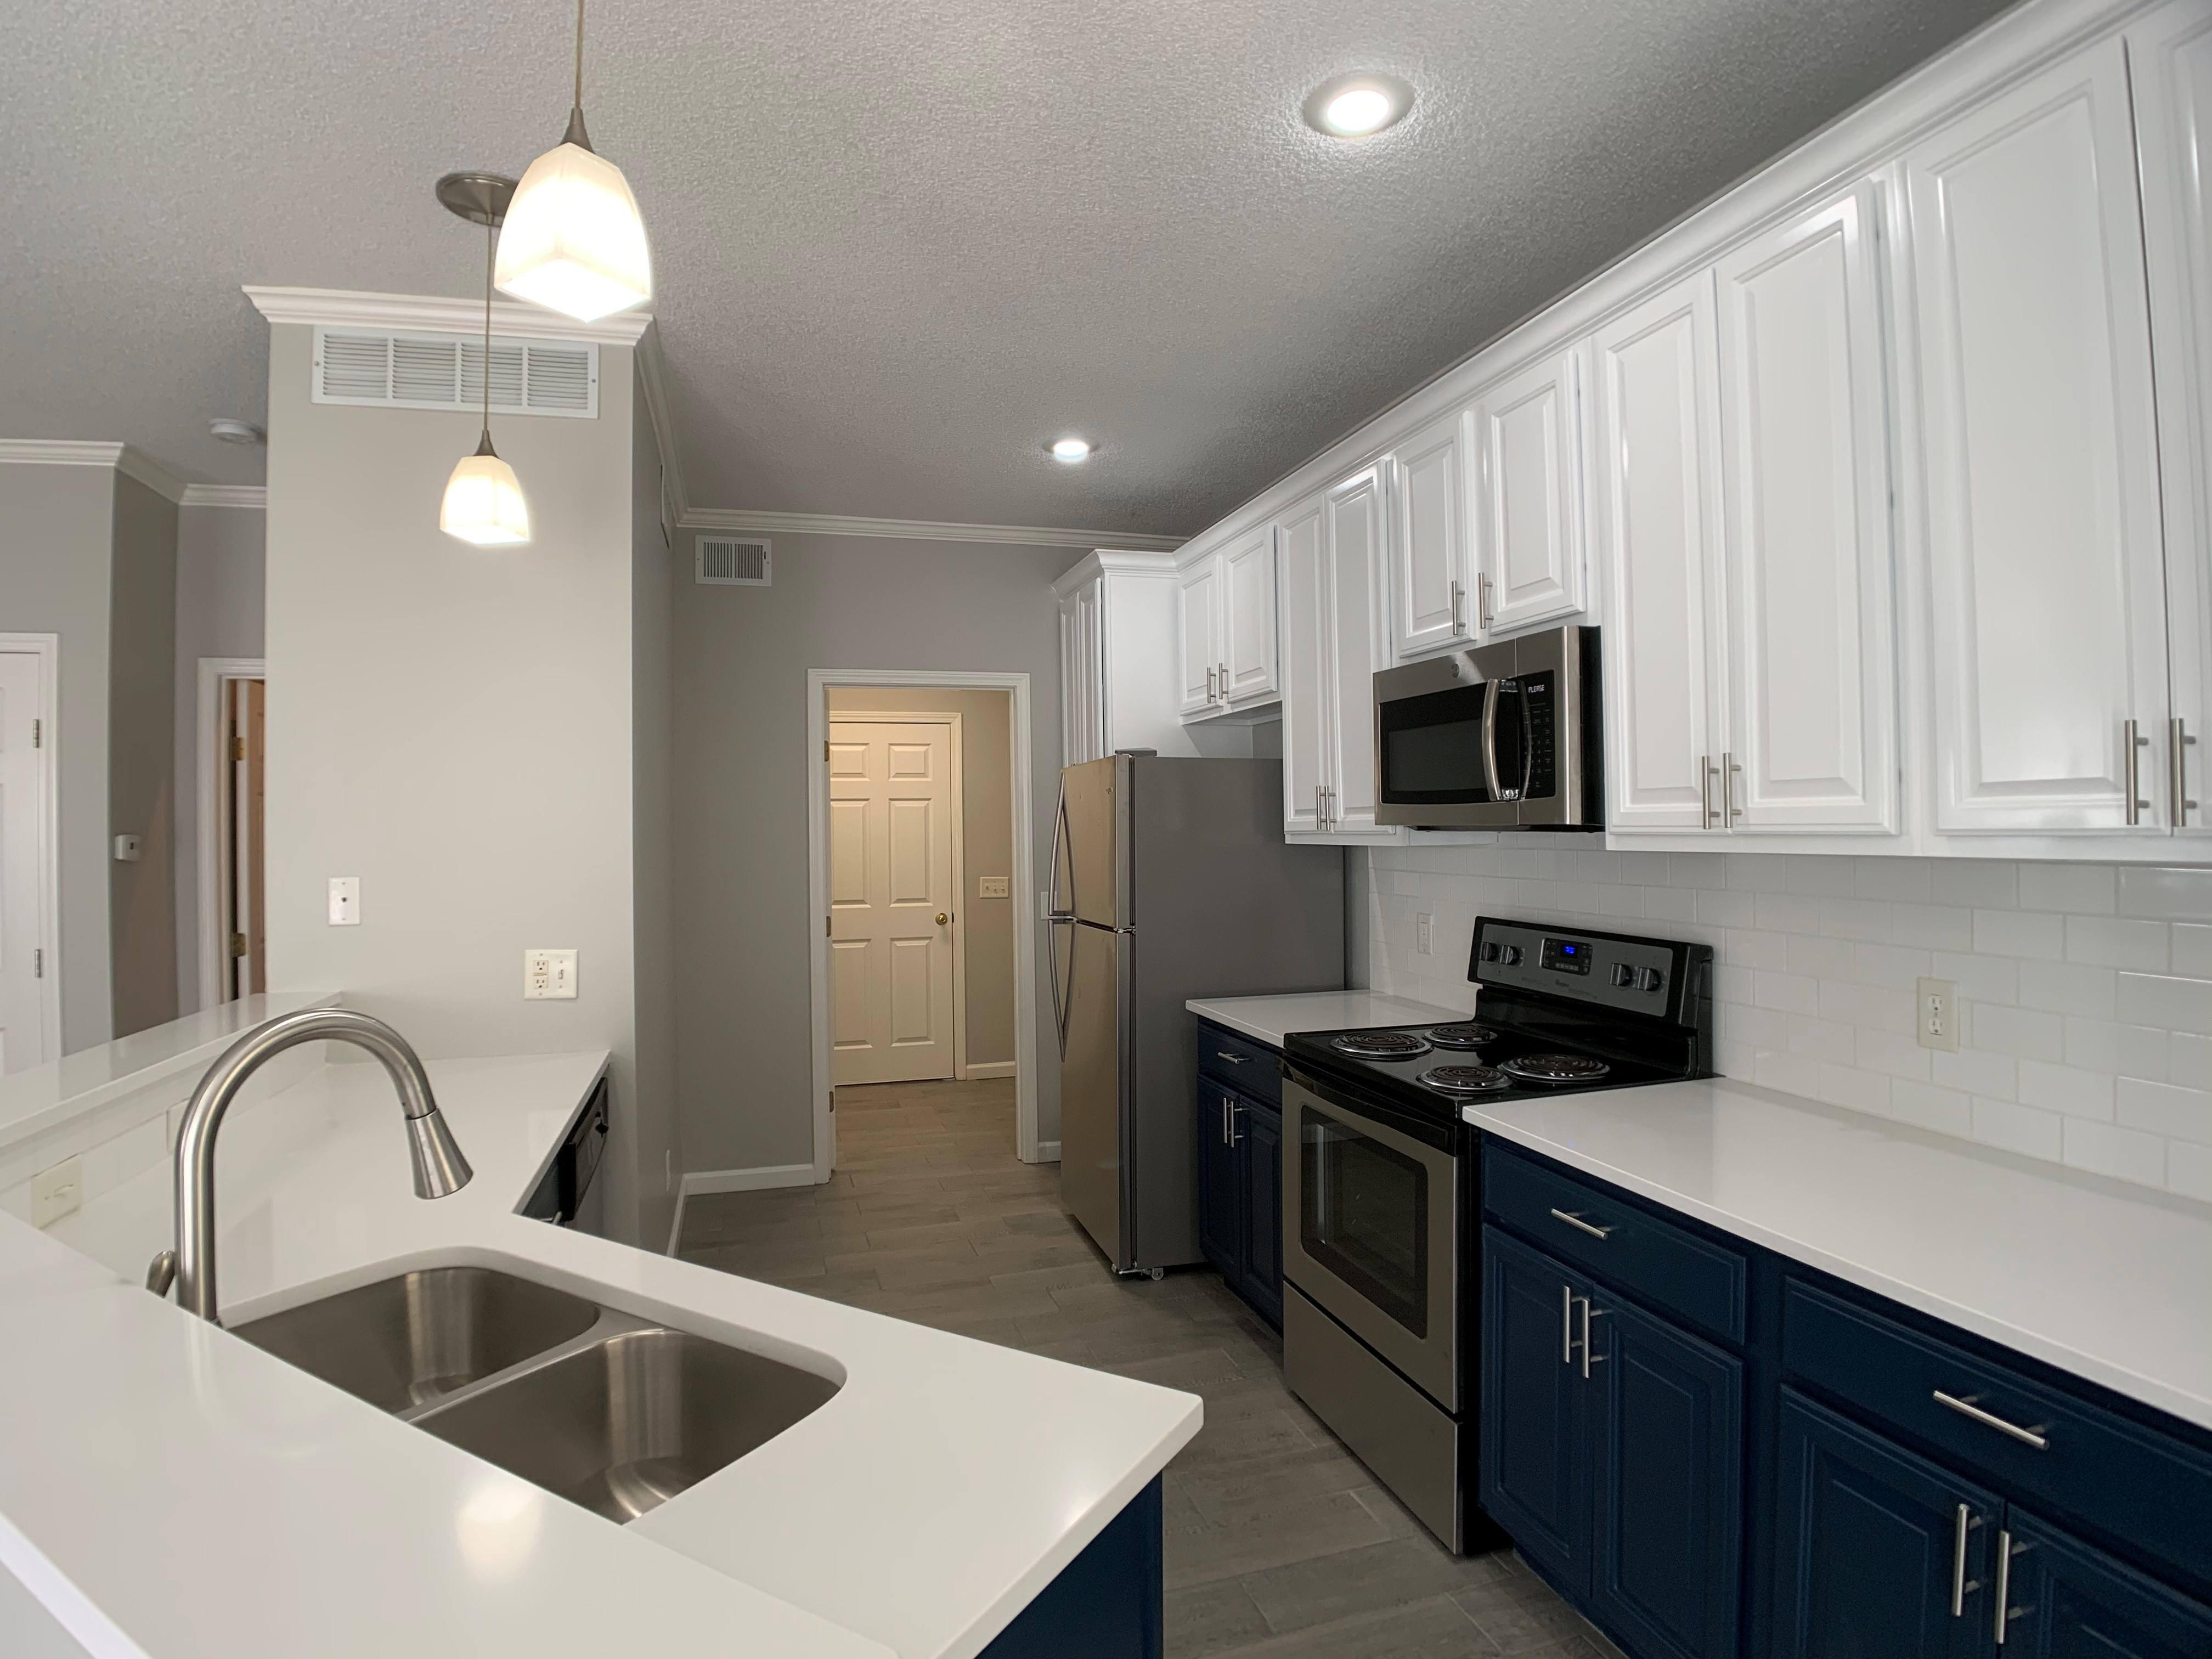 Apartments Near Avila Villas of Loiret Townhomes for Avila University Students in Kansas City, MO